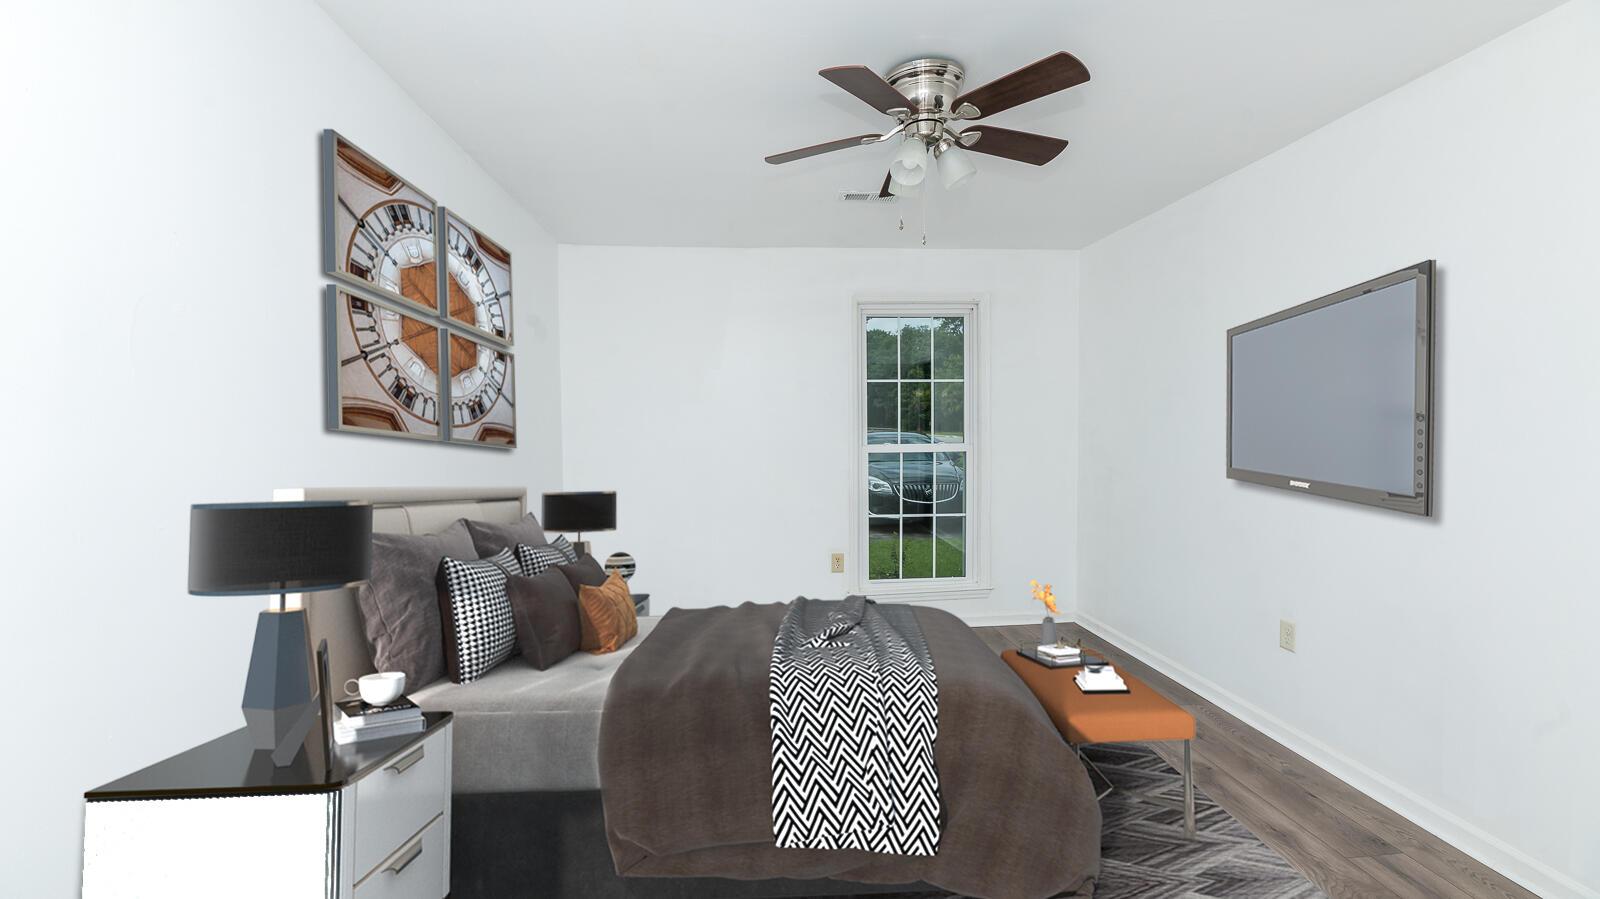 Ashley Villas Homes For Sale - 4315 Briarstone, North Charleston, SC - 0